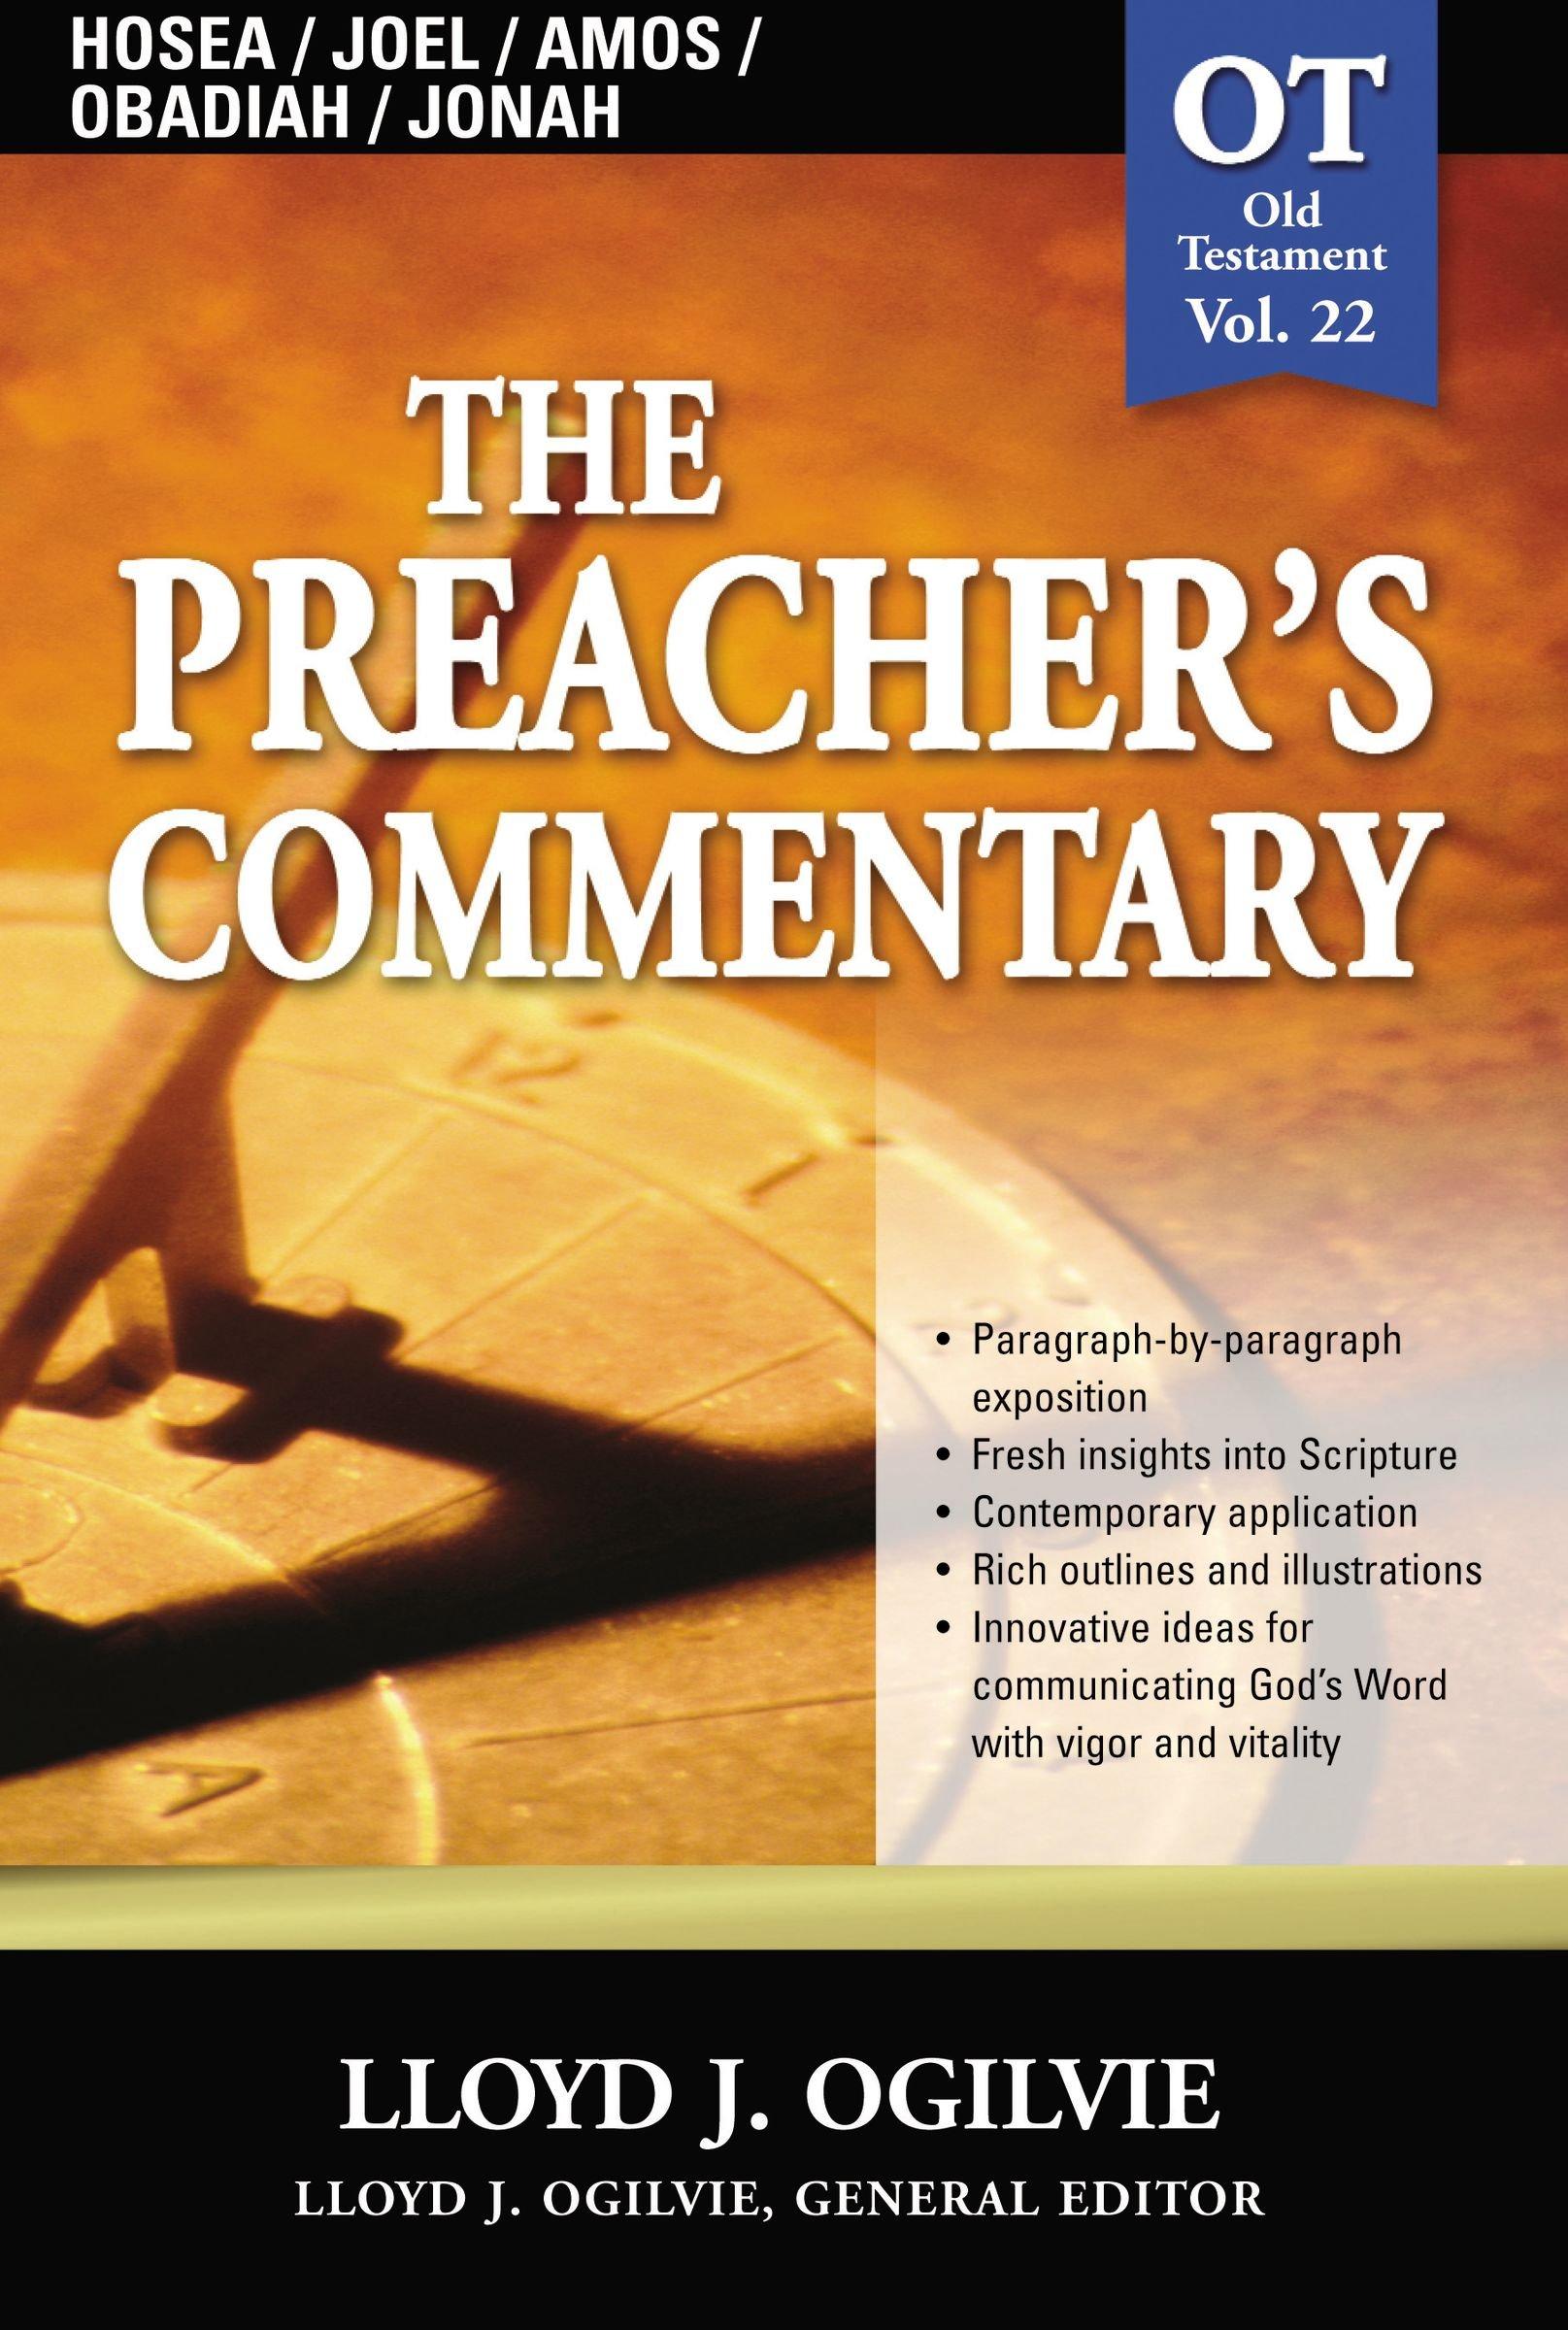 Download Preacher's Commentary, Vol. 22: Hosea/Joel/Amos/Obadiah/Jonah ebook